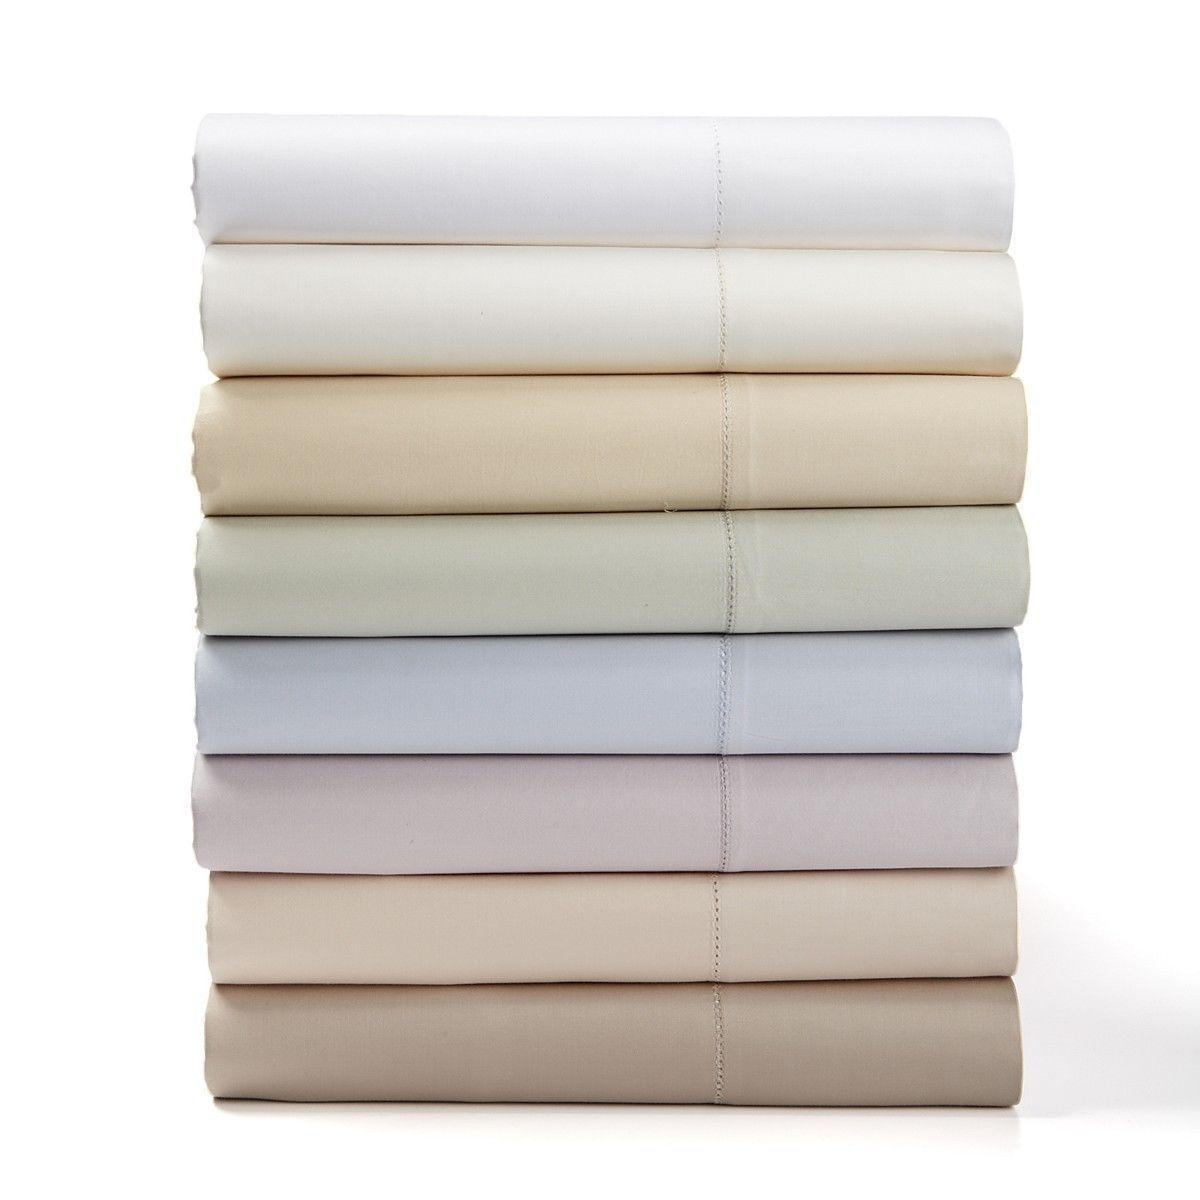 NIP Charisma Premium Avery 600TC Vanilla King Fitted & Flat Sheets (2pc)